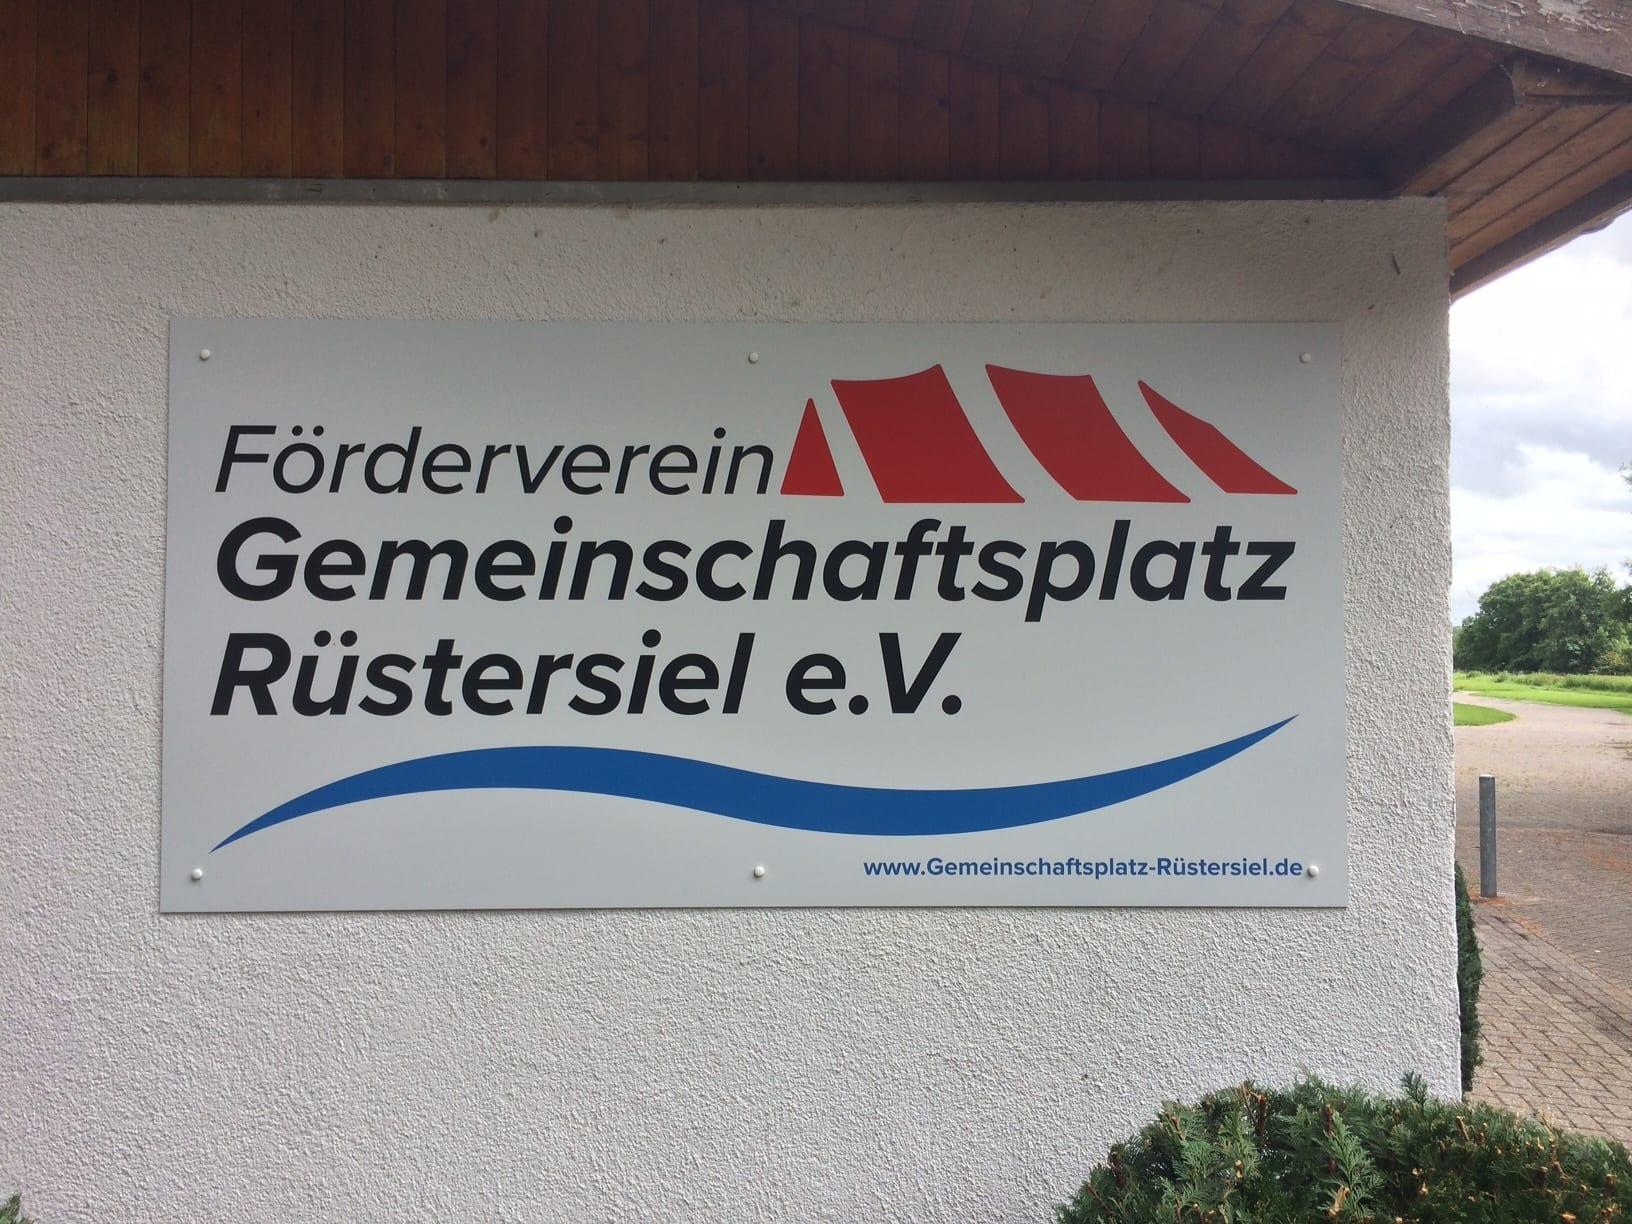 Förderverein Gemeinschaftsplatz Rüstersiel Plakatwerbung Osnabrück